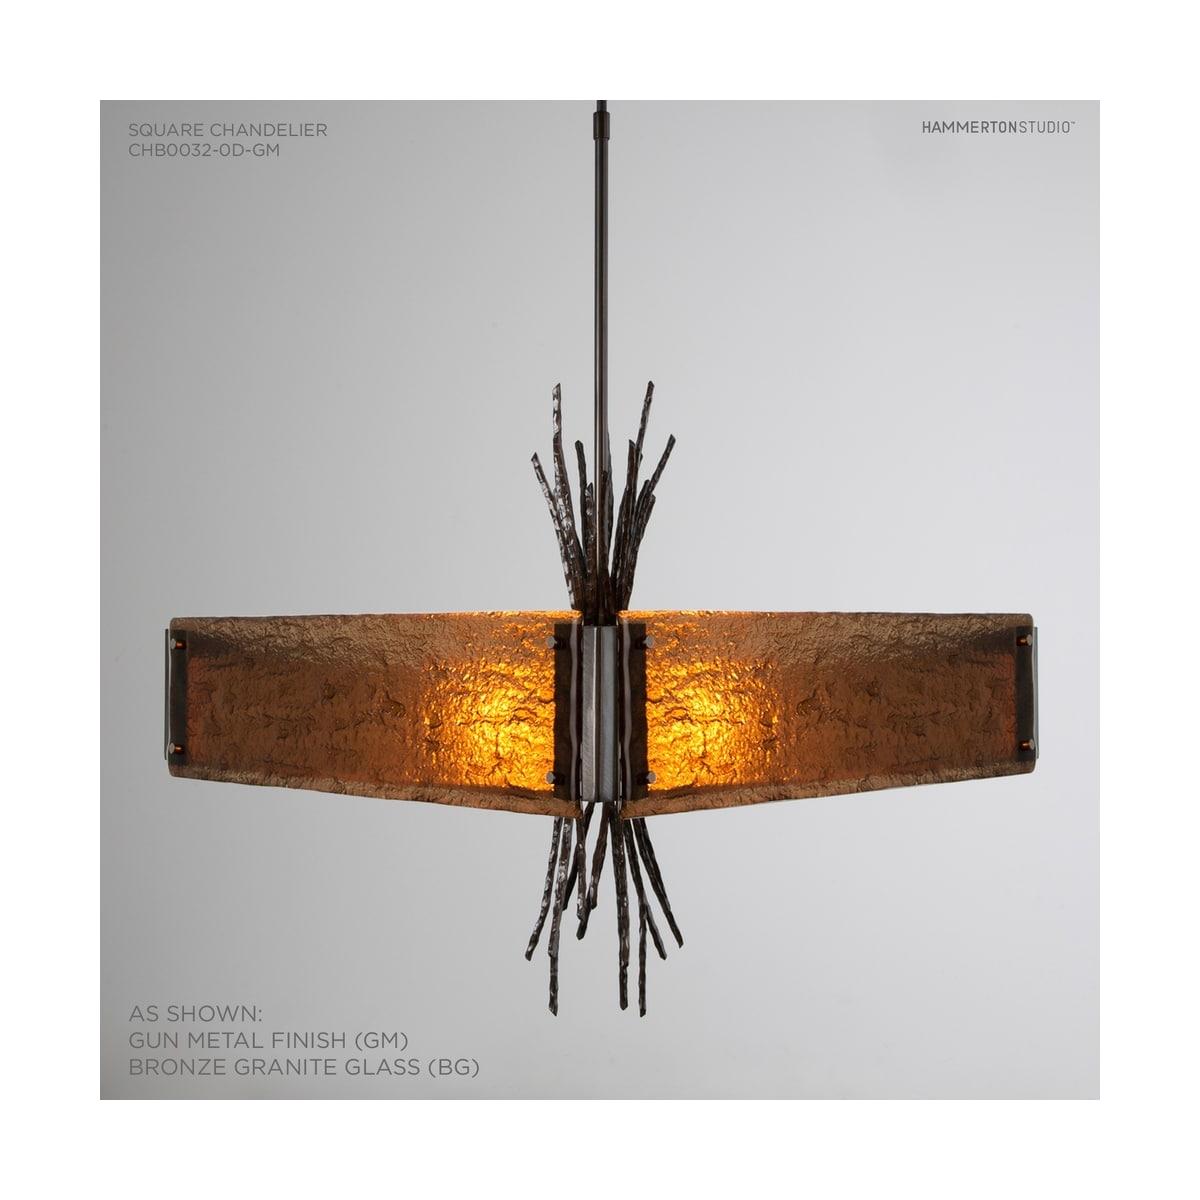 hammerton studio chb0032 0d sn xx 001 xx satin nickel ironwood 4 light 24 wide chandelier with configurable glass shade lightingshowplace com